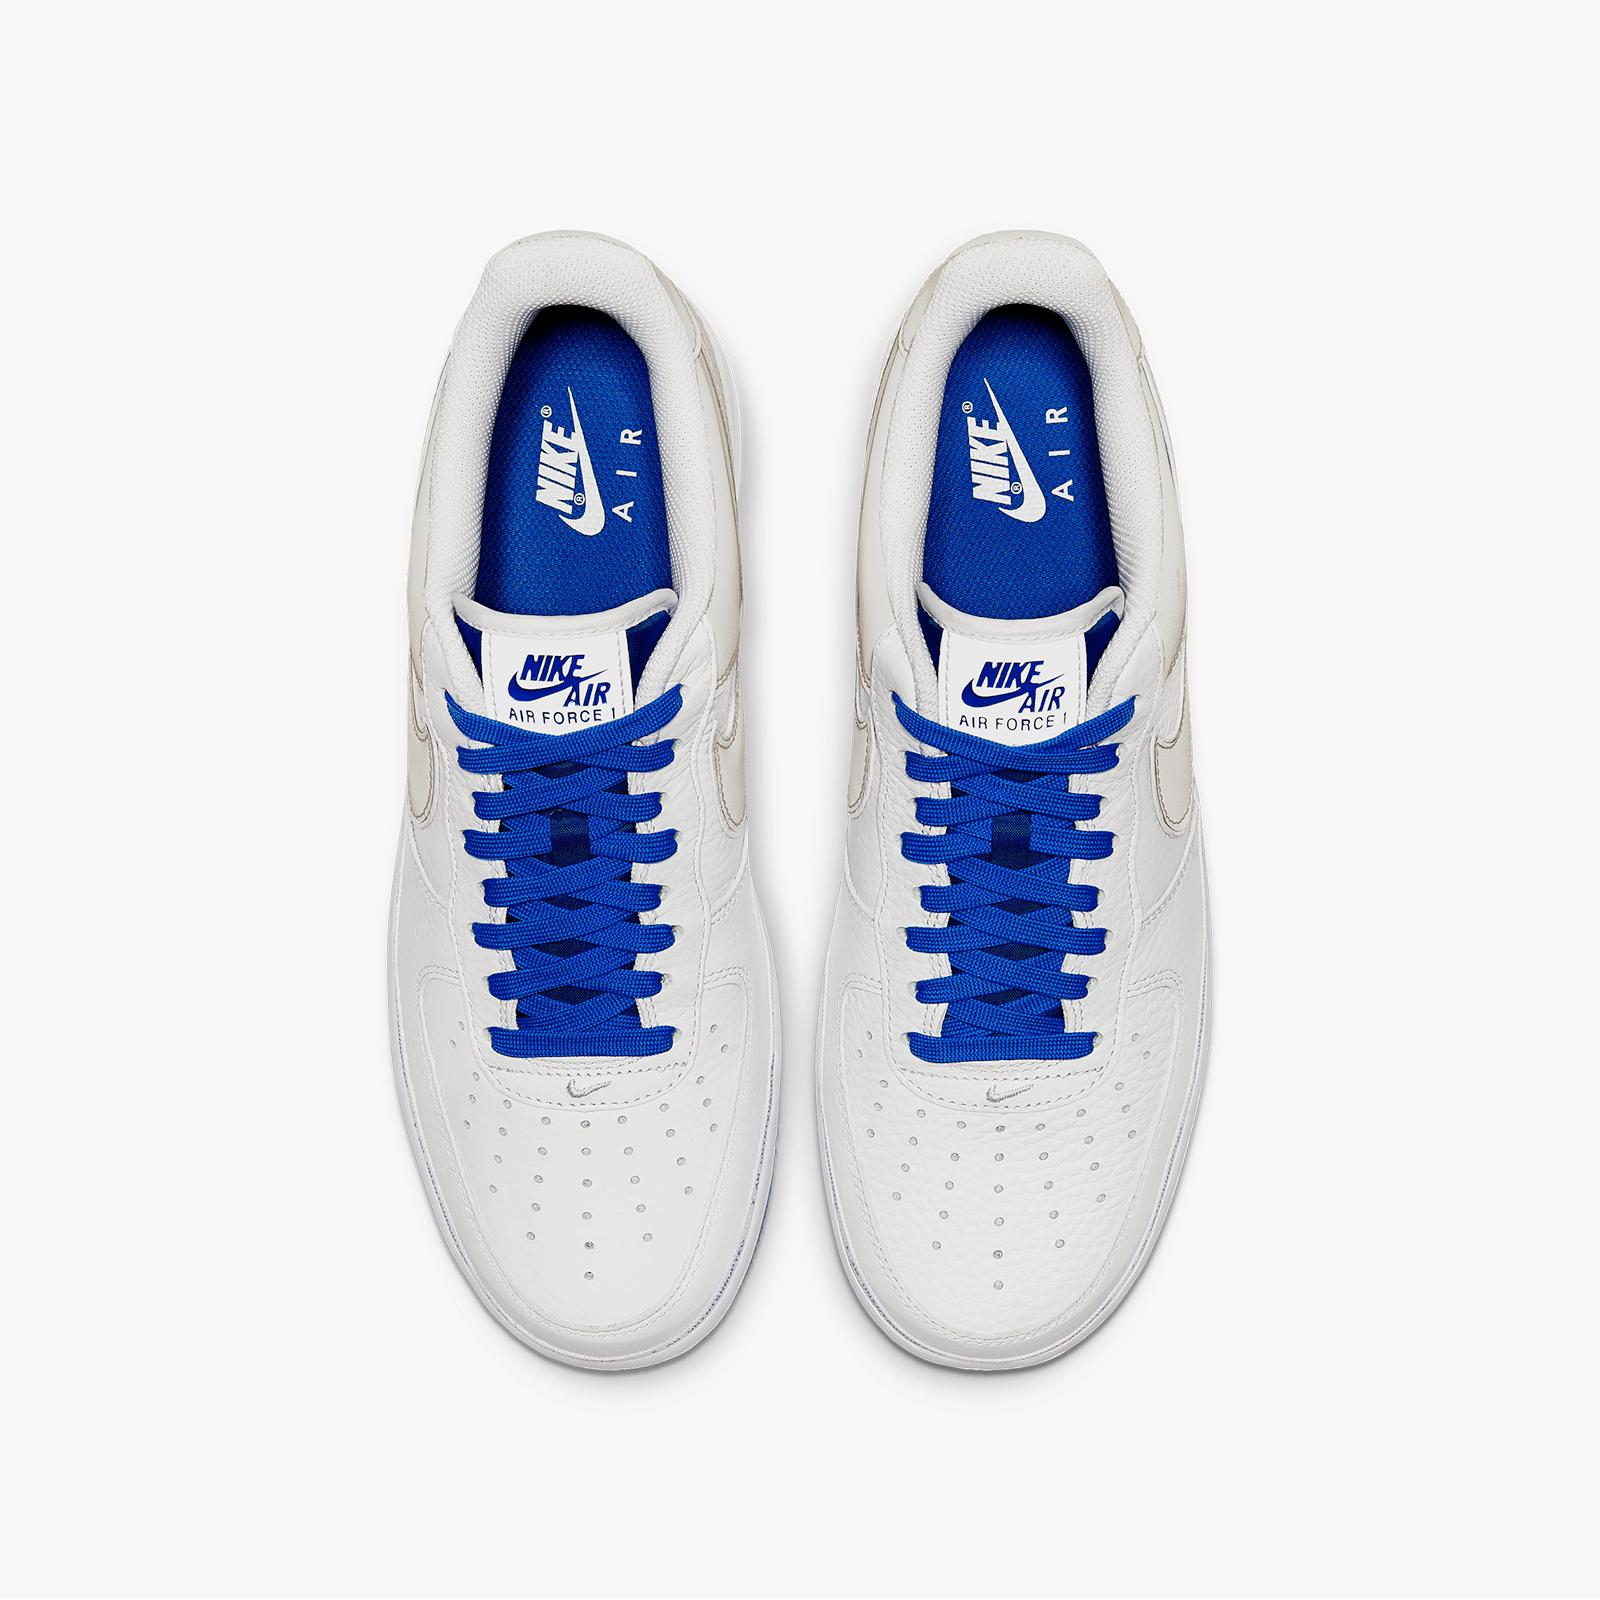 "Produce Peligro Itaca  Nike Air Force 1 07 x Uninterrupted ""MTAA"" - Cq0494-100 - Sneakersnstuff |  sneakers & streetwear online since 1999"